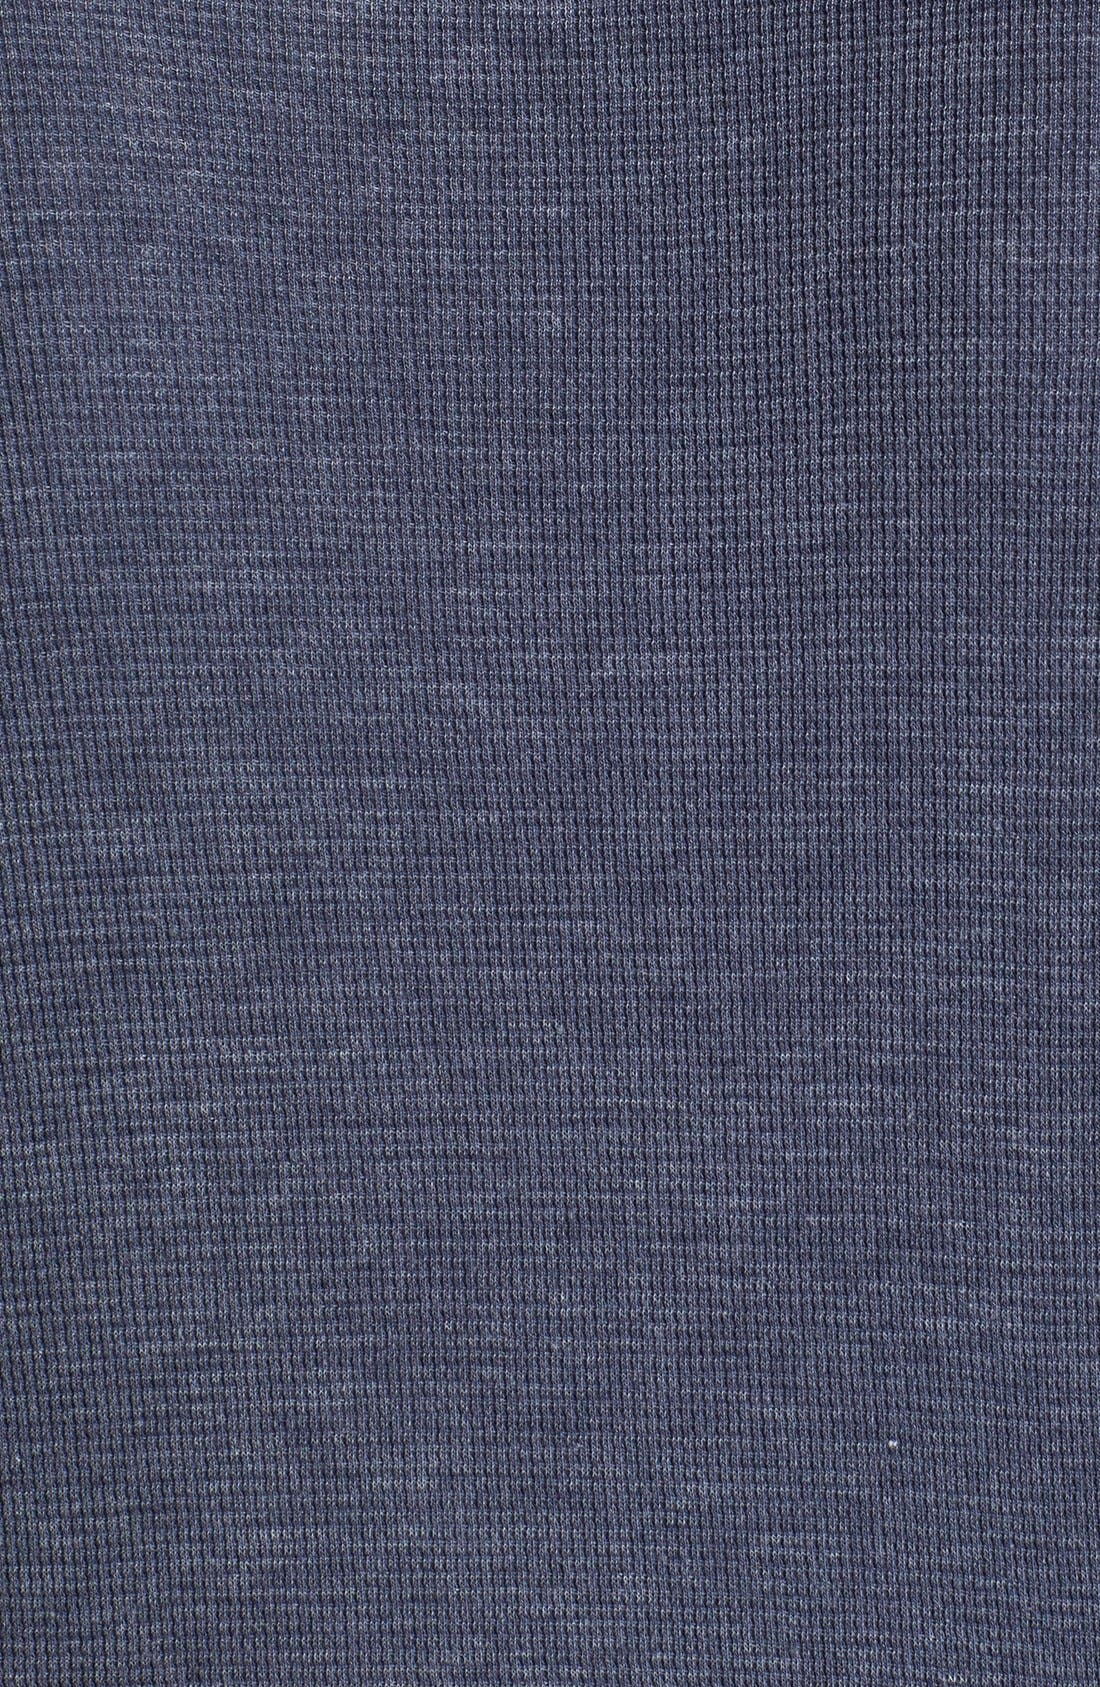 Alternate Image 3  - Red Jacket 'Cardinals - Thermal Burn' Long Sleeve T-Shirt